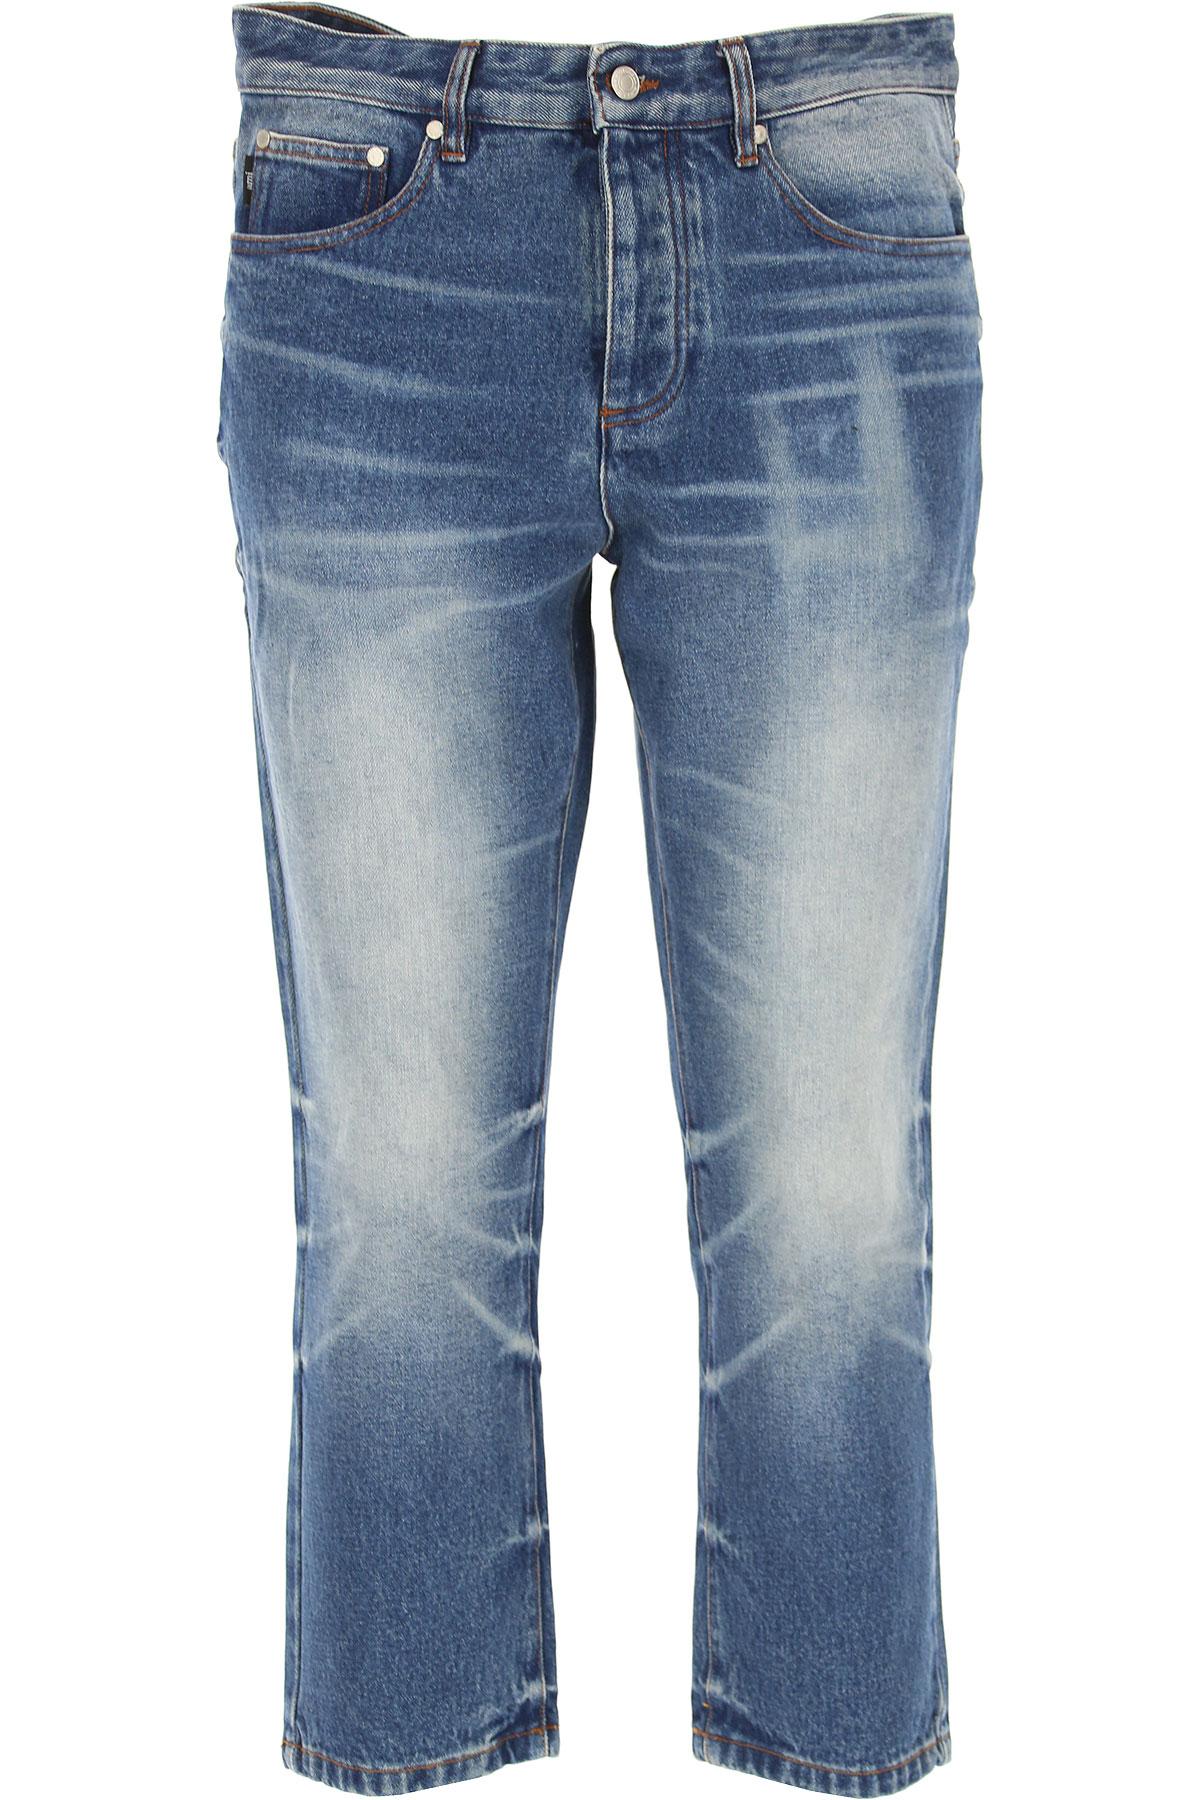 Image of Ami Jeans, Denim, Cotton, 2017, 32 33 34